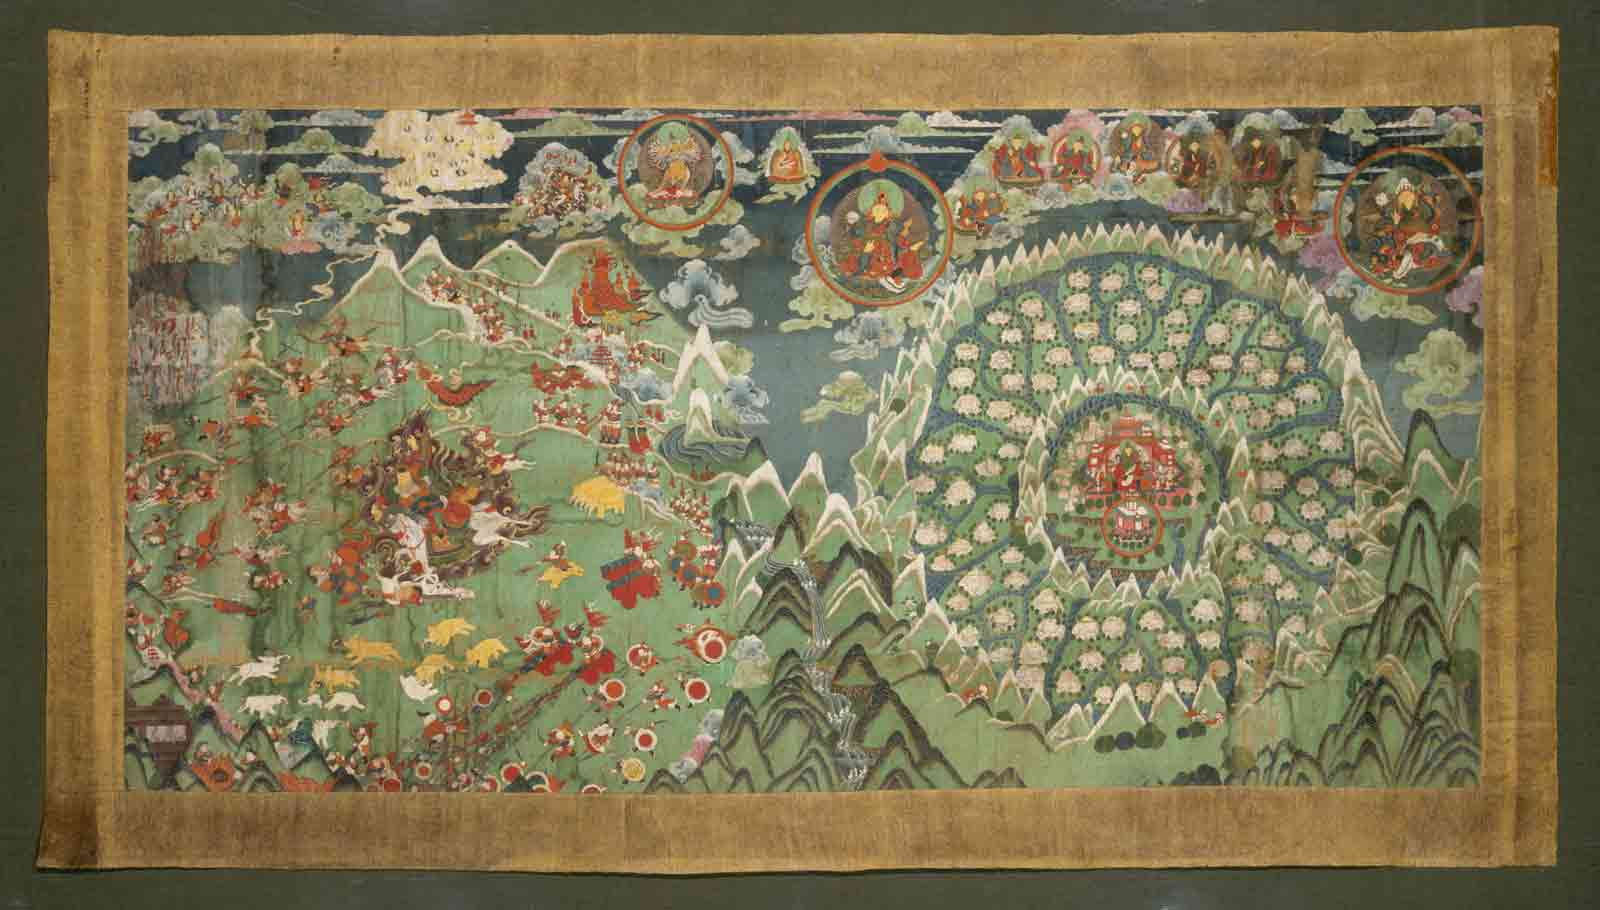 Kingdom of Shambhala and the Final Battle, Mongolia, nineteenth century